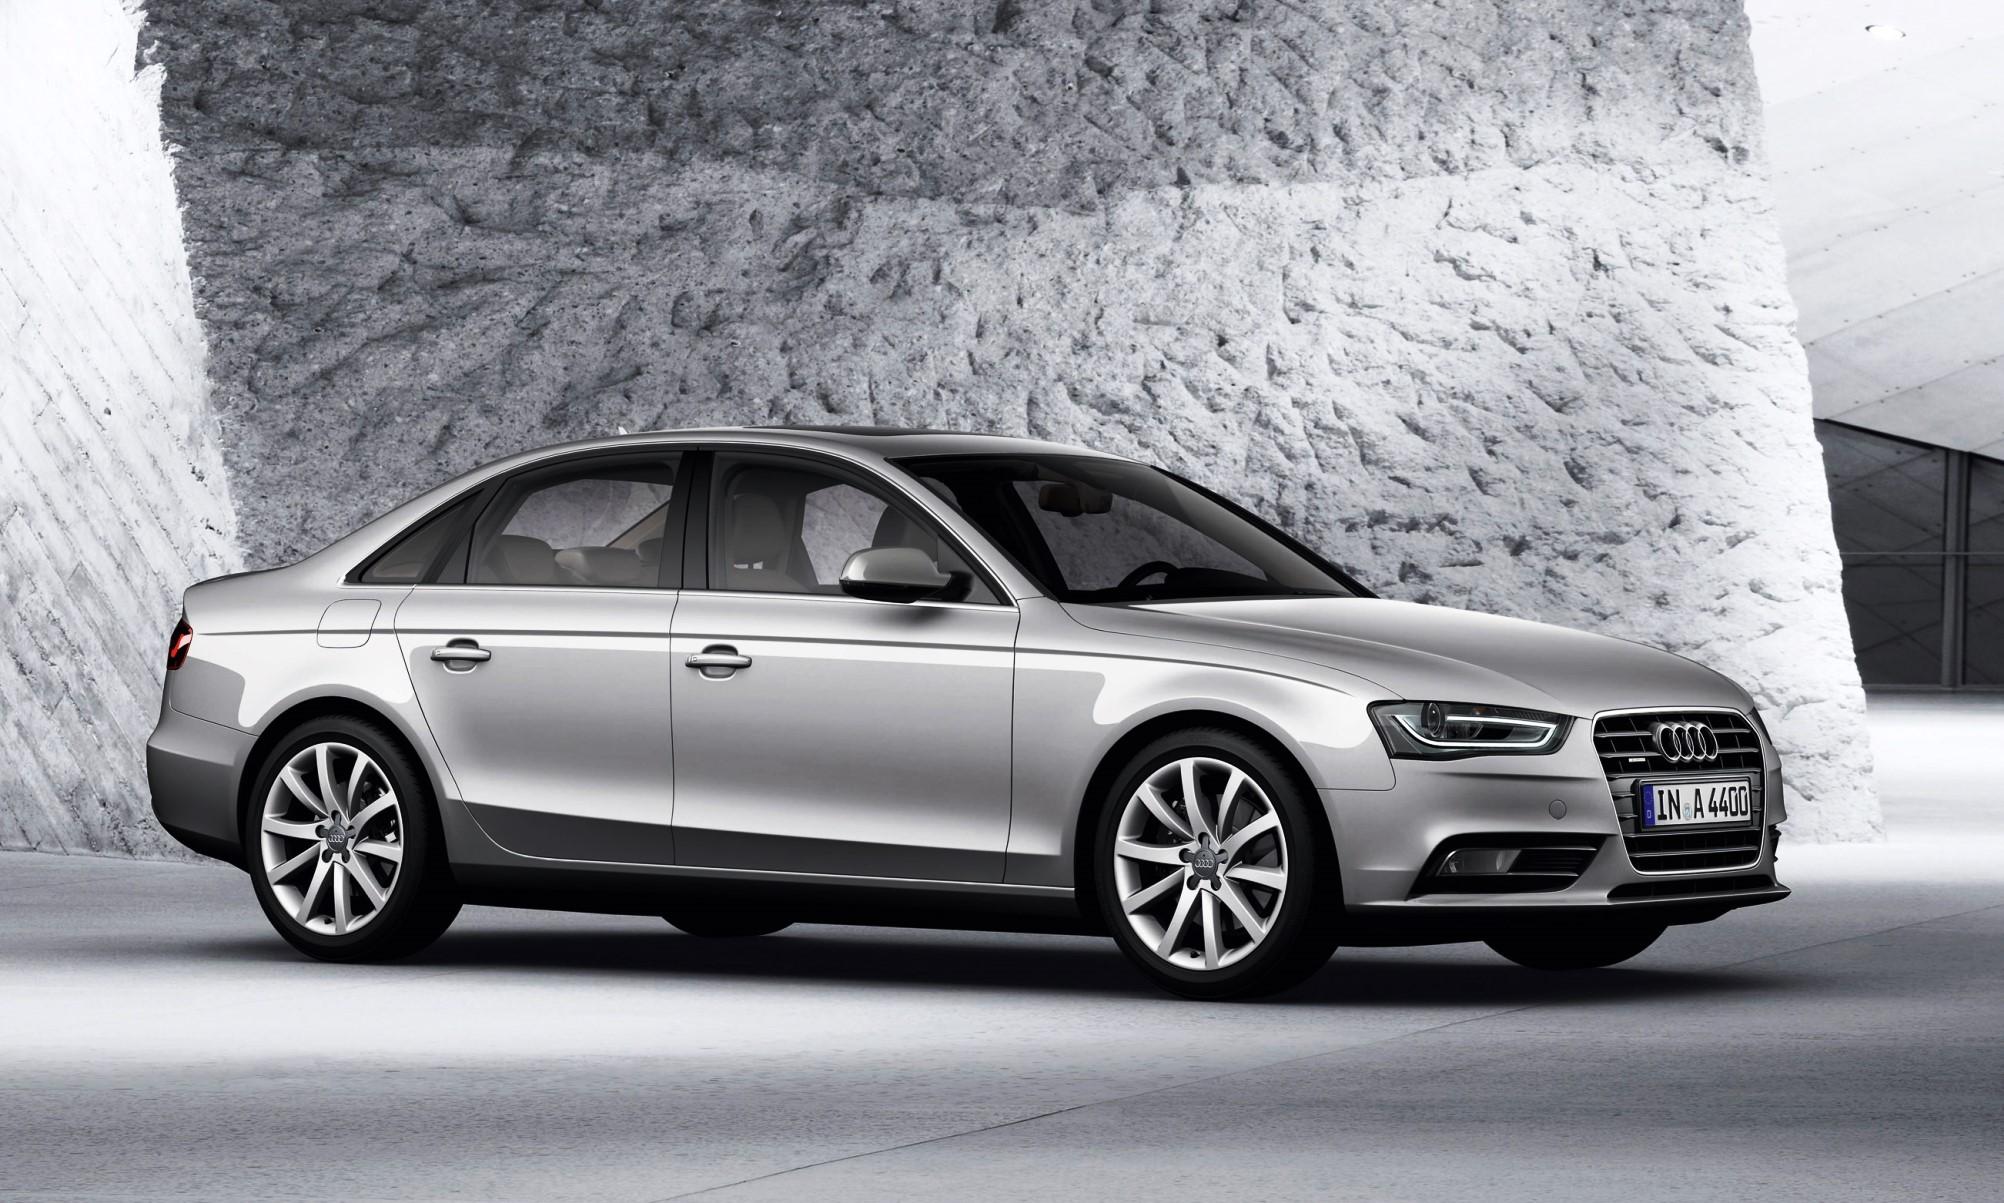 Audi A4 Sedan 3.0 TFSI Quattro S tronic